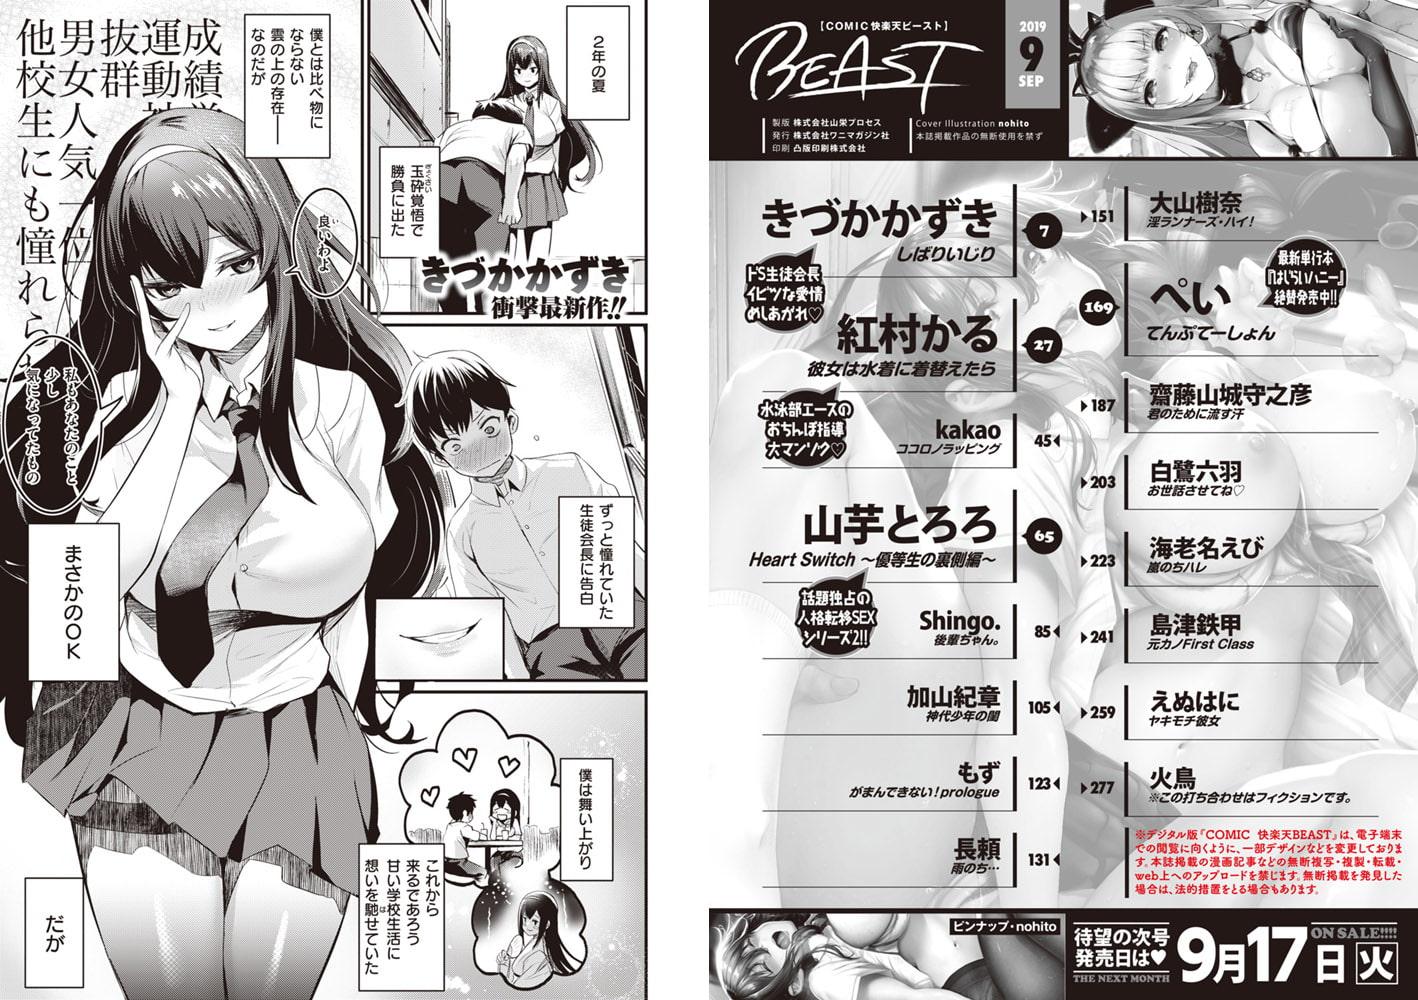 COMIC快楽天ビースト 2019年9月号